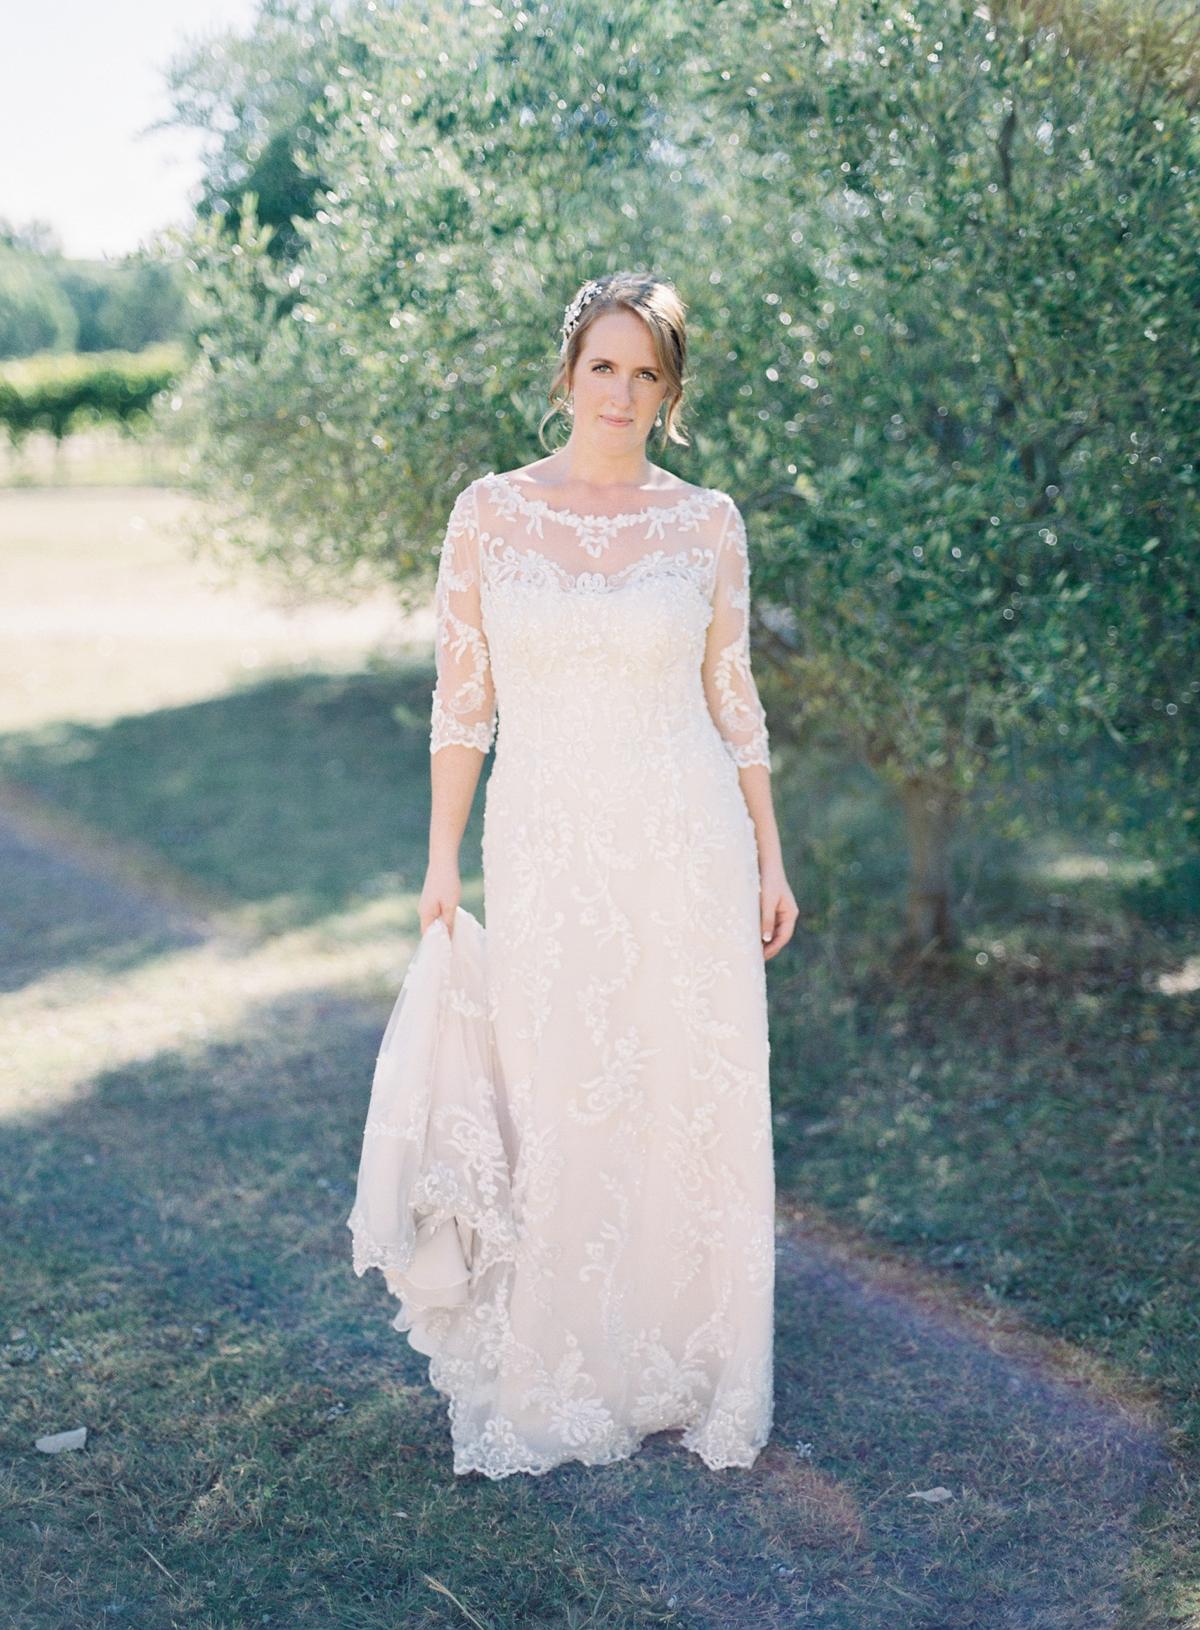 The Vine Grove Mudgee Wedding, Photography by Mr Edwards_1826.jpg